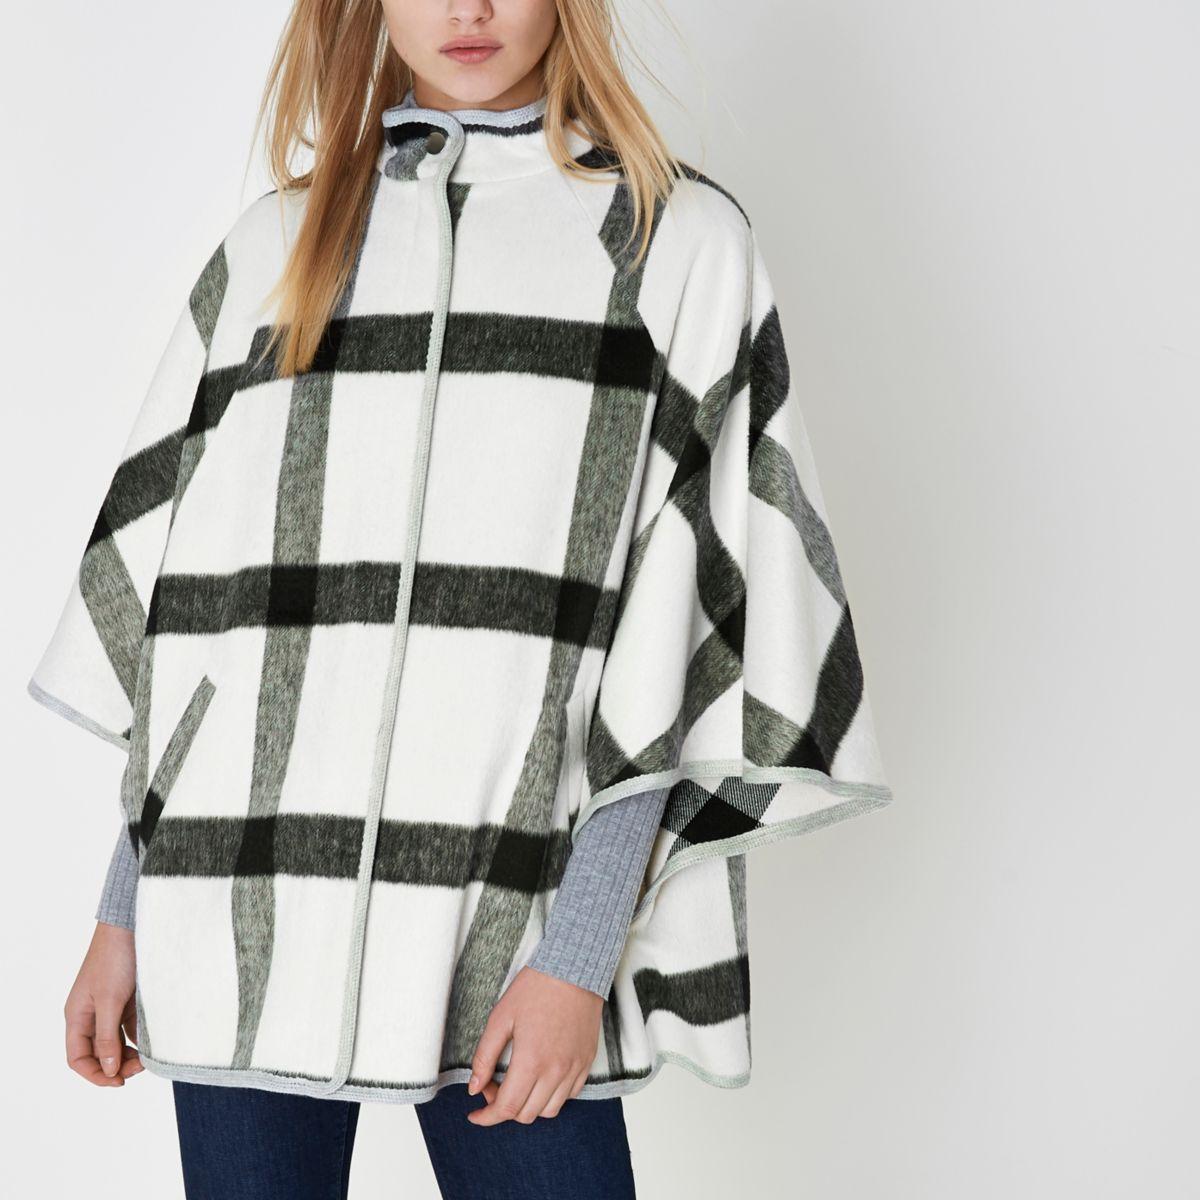 White oversized check cape high neck jacket